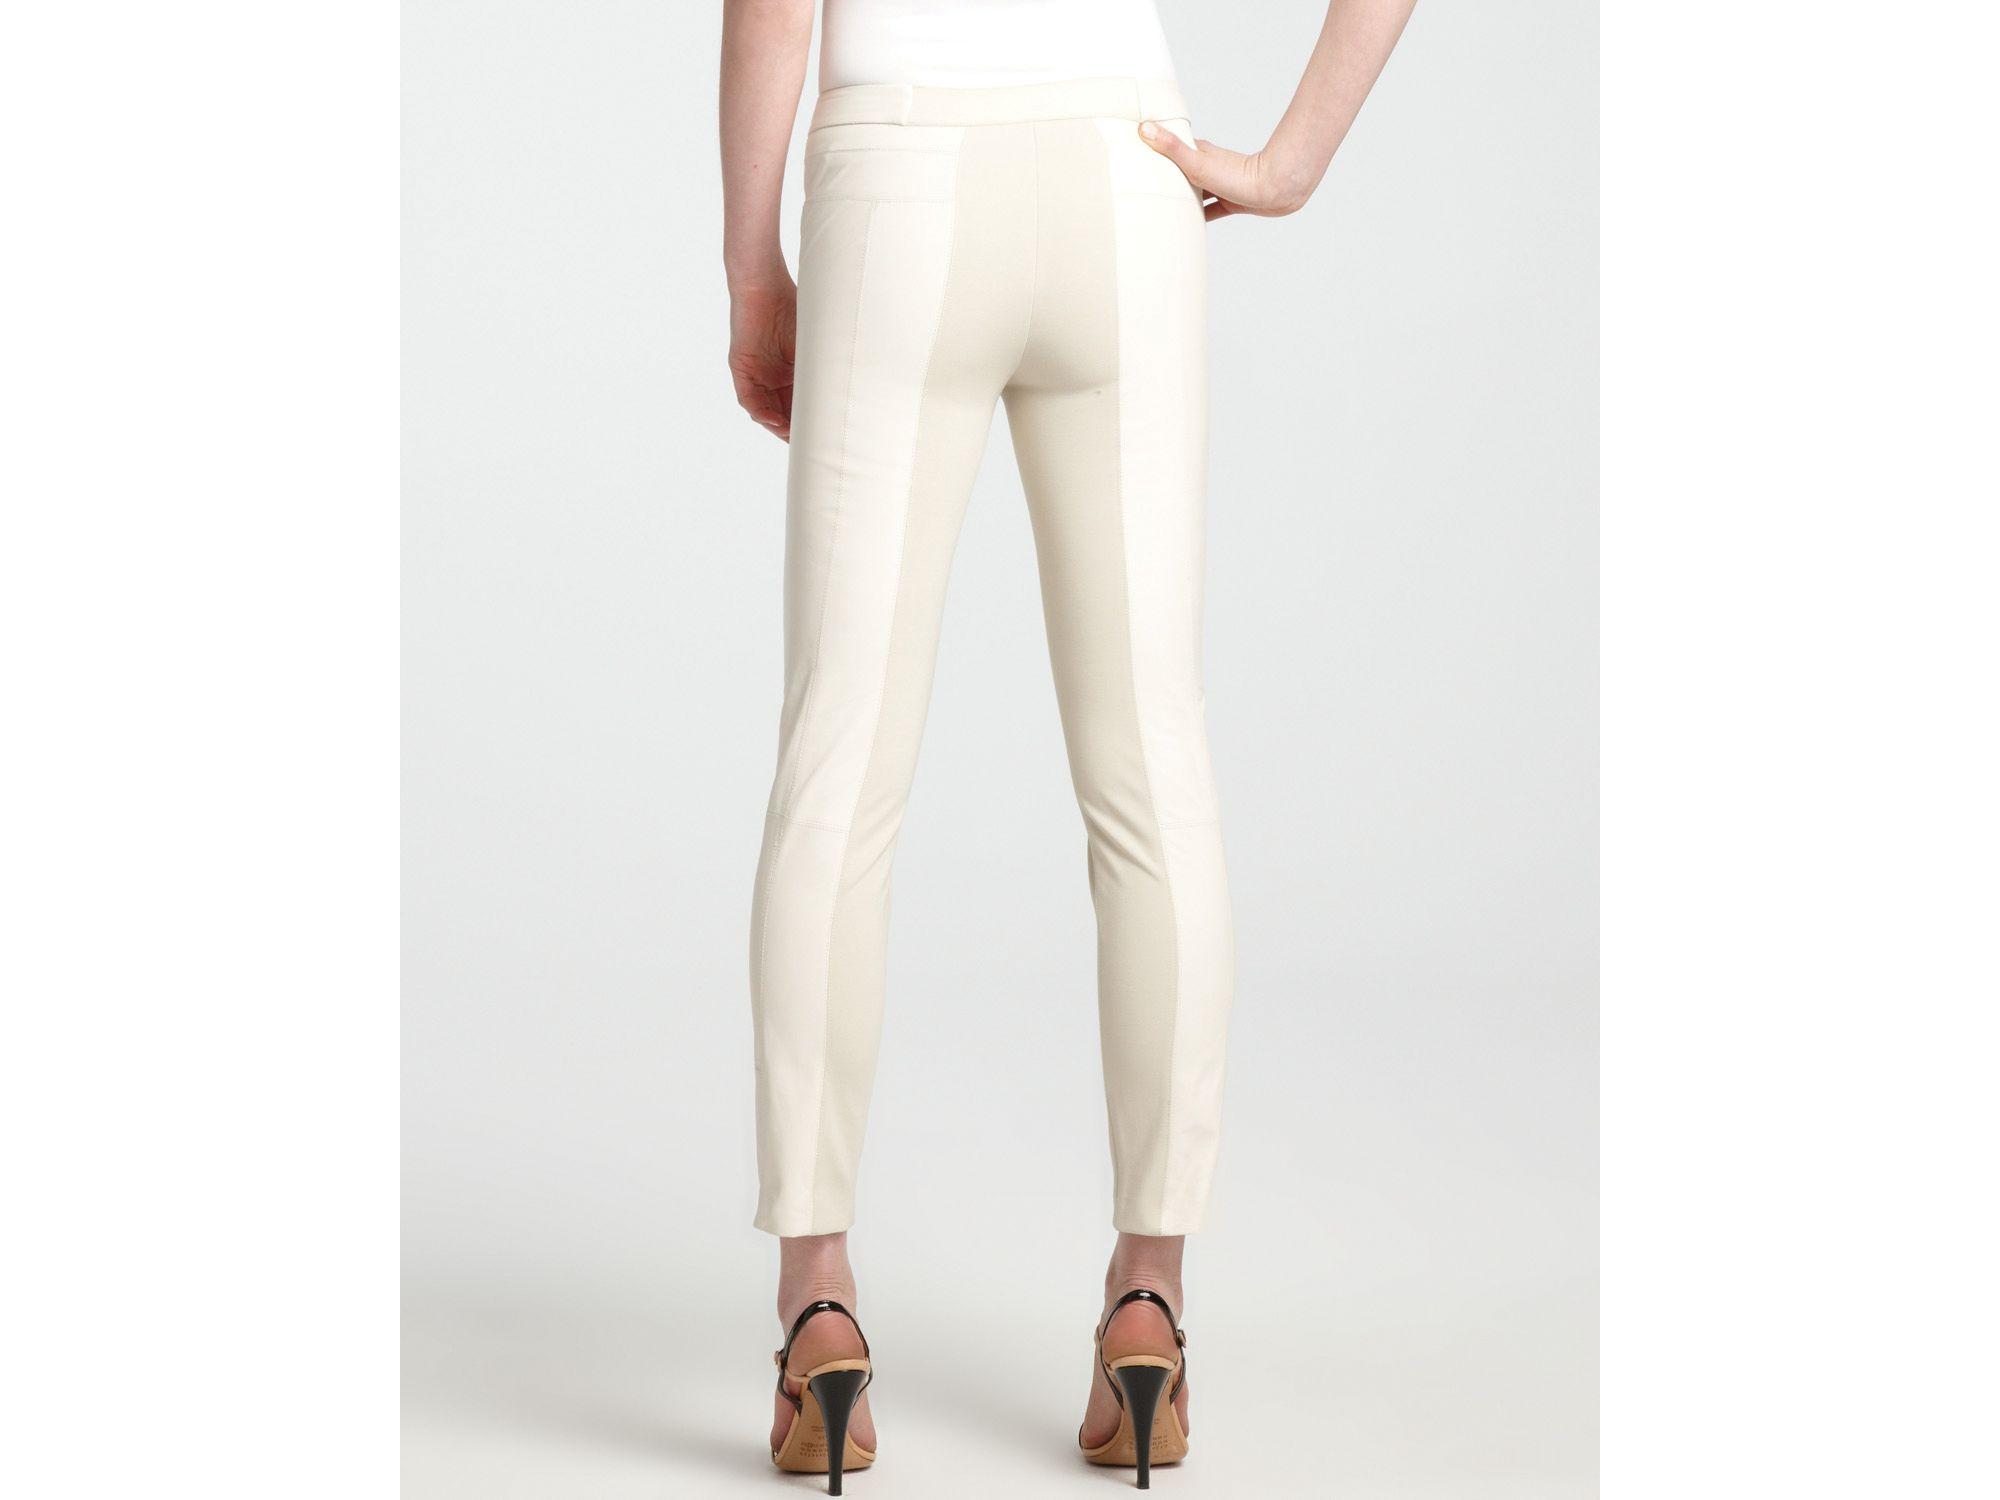 e324dd78346dd Halston Leather Pants Ponte Trim in White - Lyst